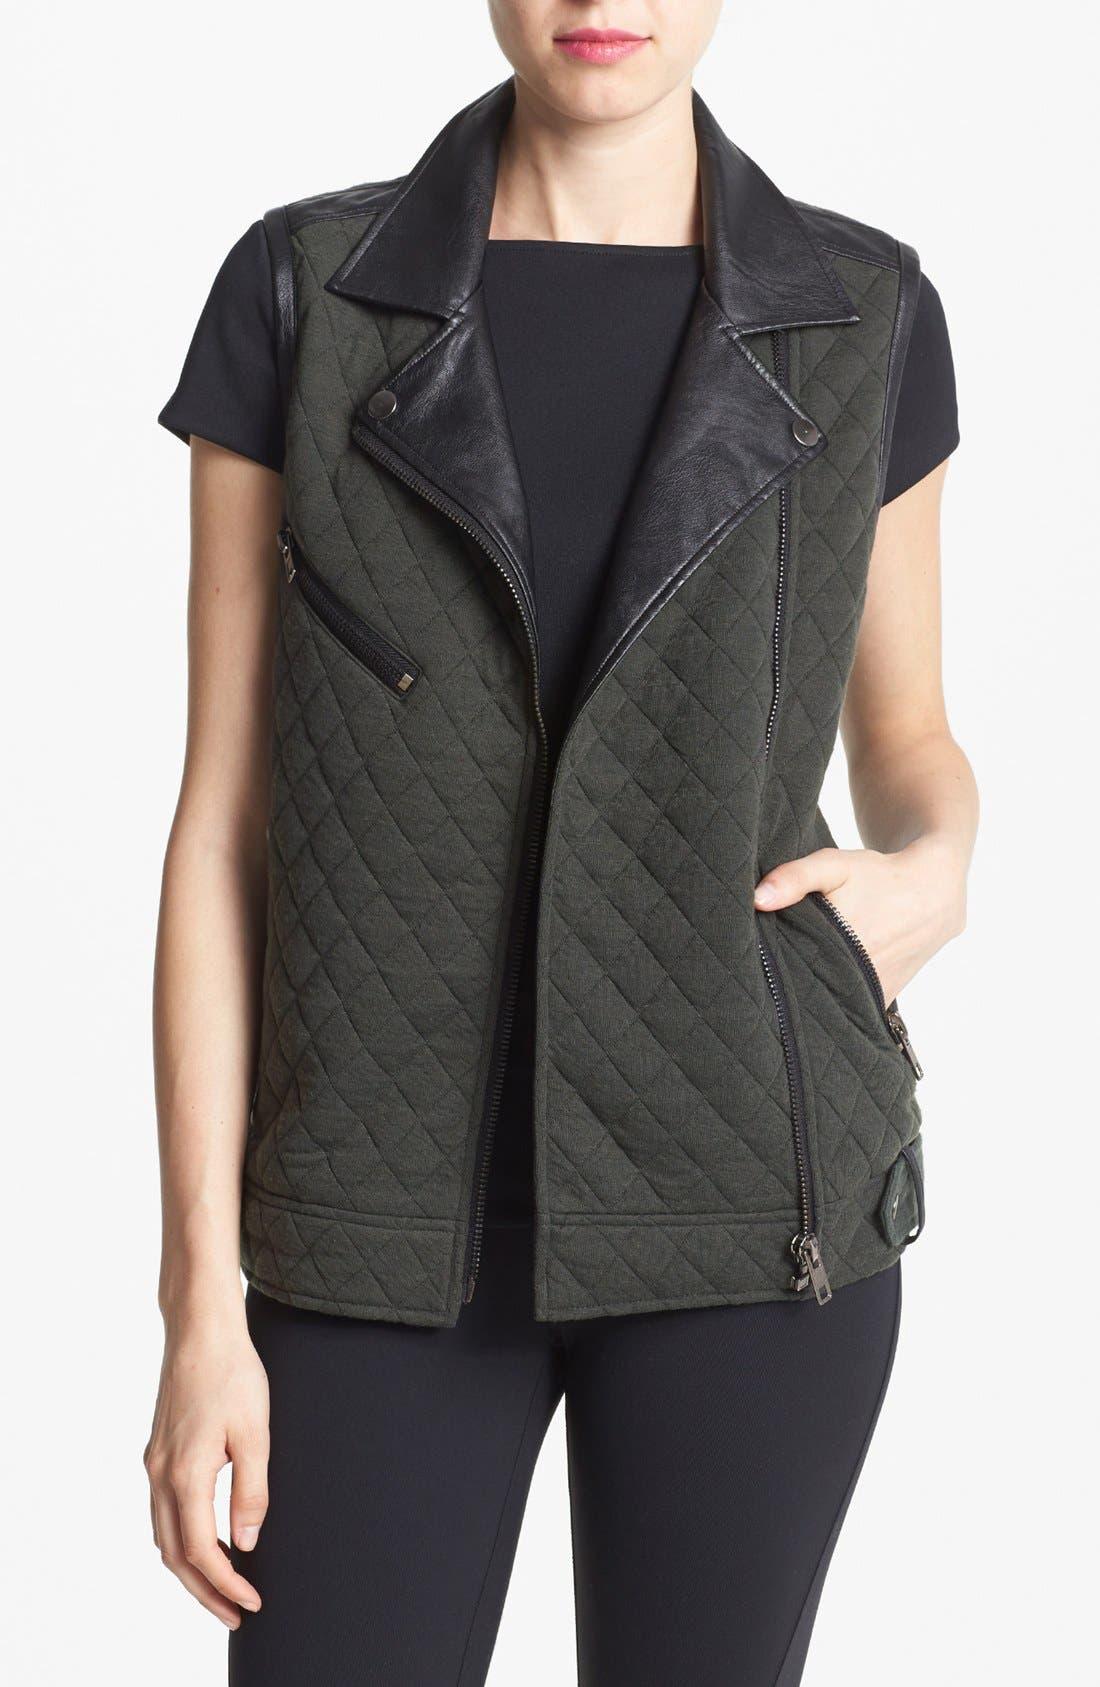 Alternate Image 1 Selected - ASTR Quilted Fleece Moto Vest